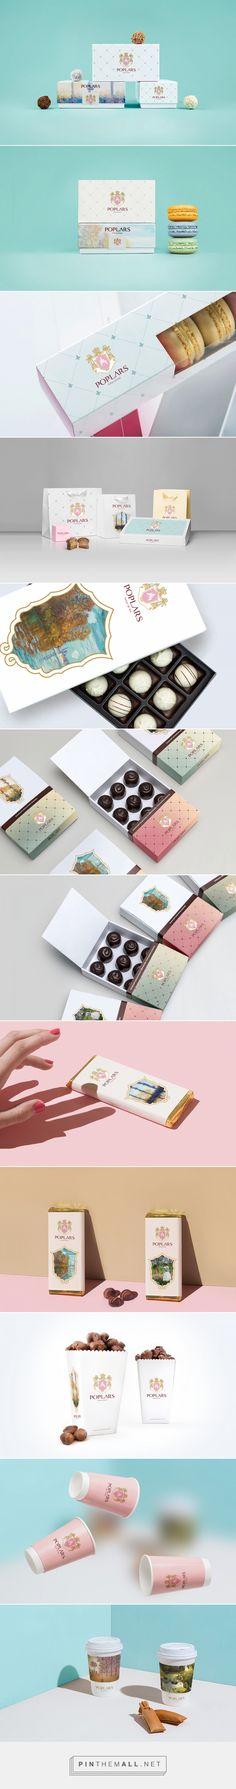 POPLARS Chocolate by Abdulaziz Aljafen